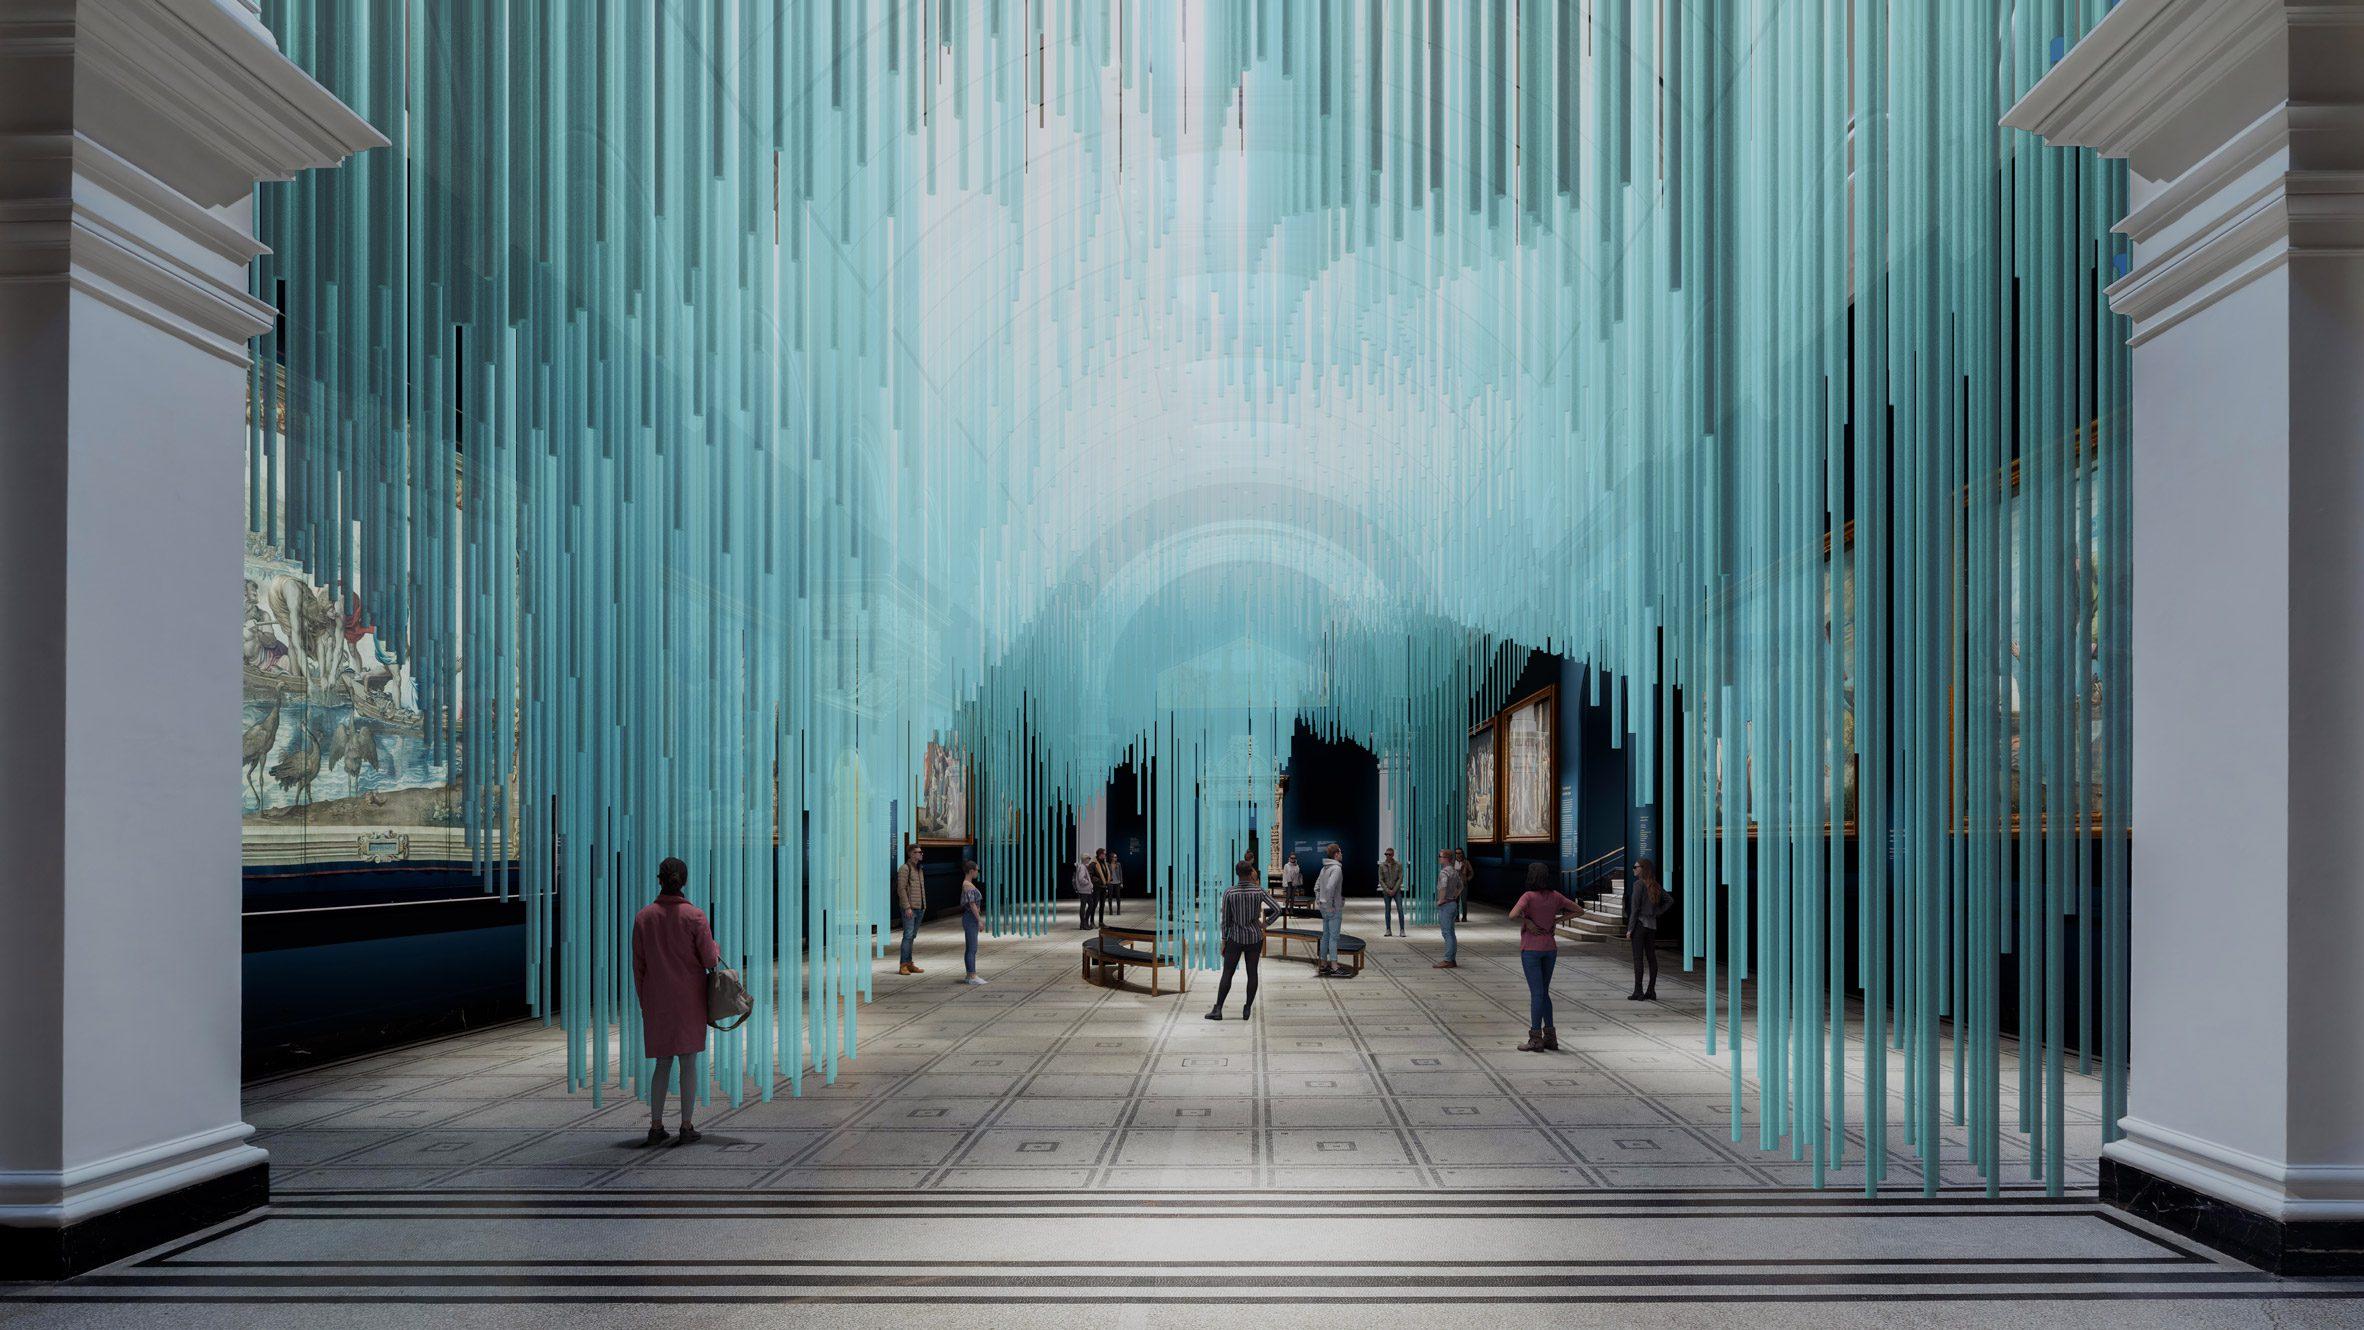 A blue light installation by Sou Fujimoto